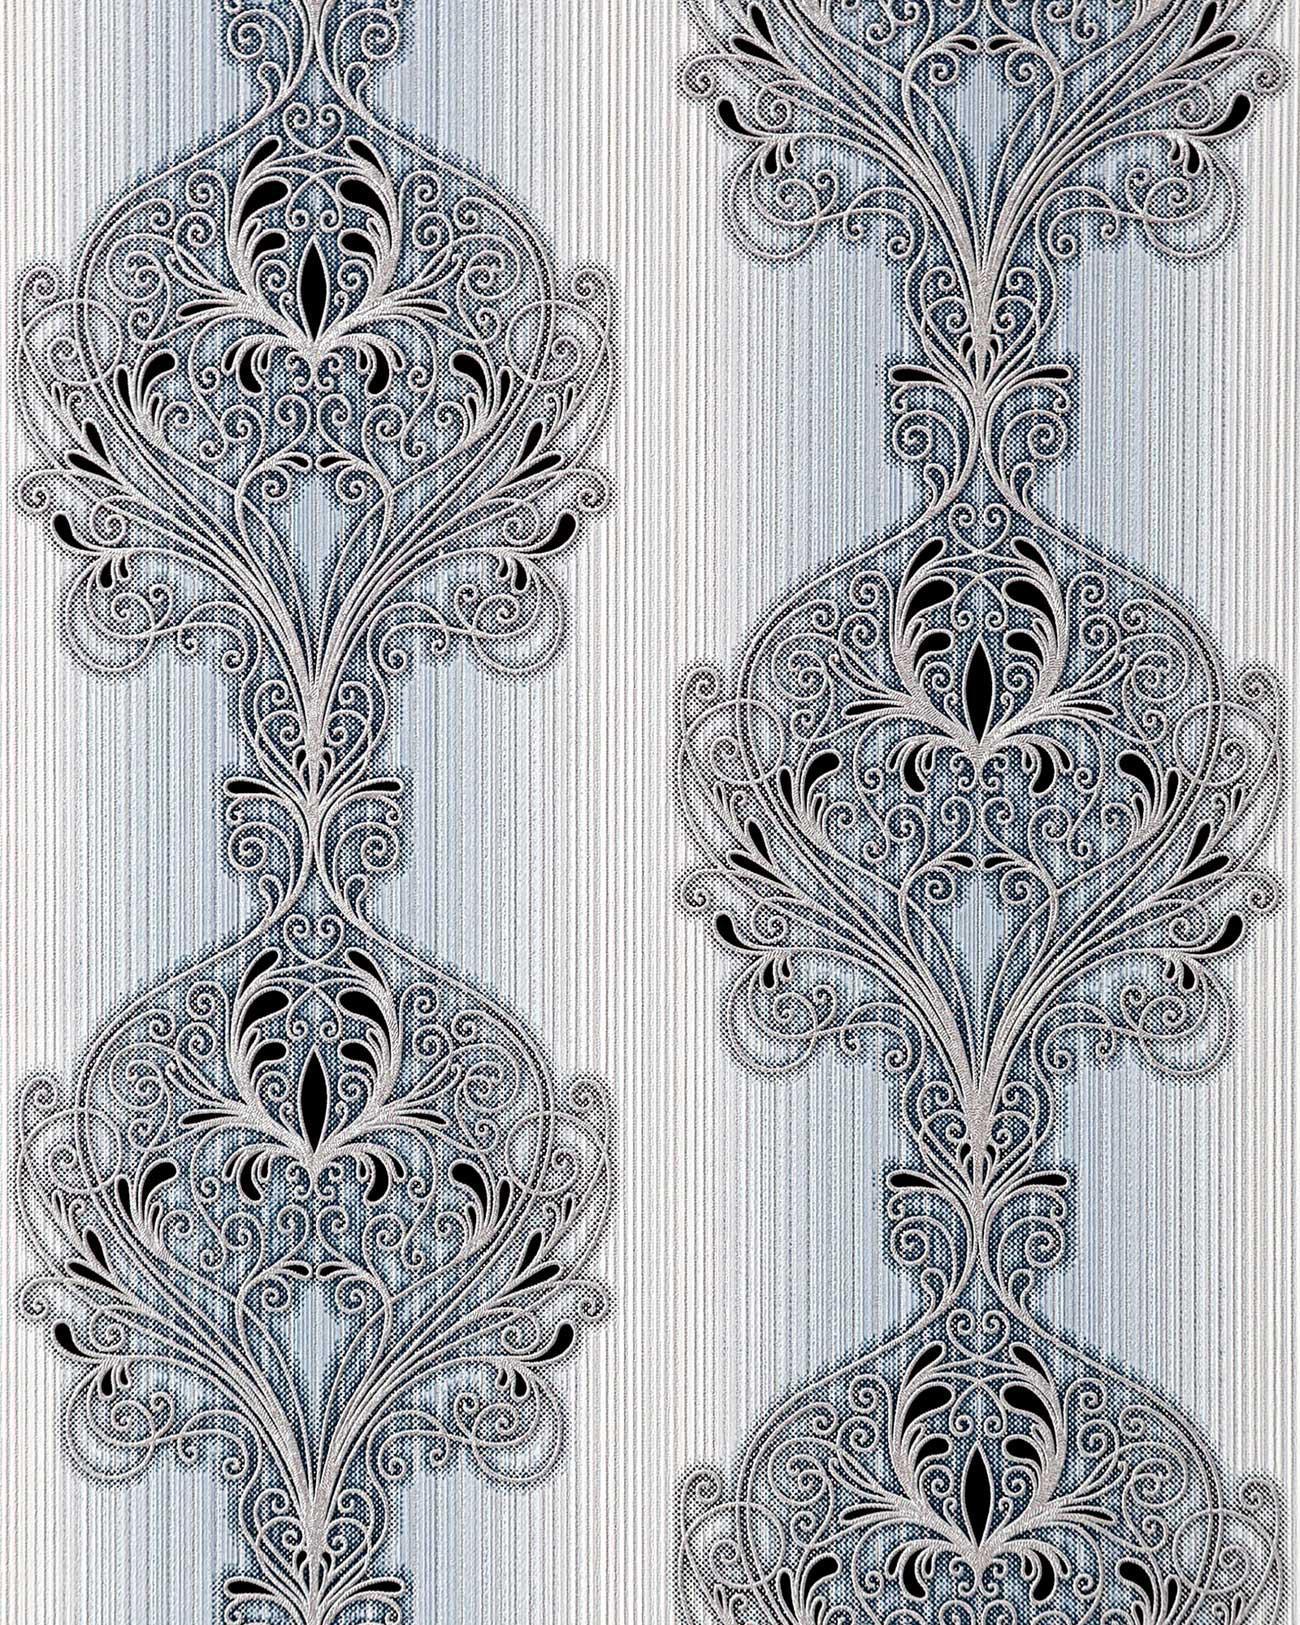 3D Barock Tapete EDEM 096-26 Tapete Damask prunkvolle Ornament ...